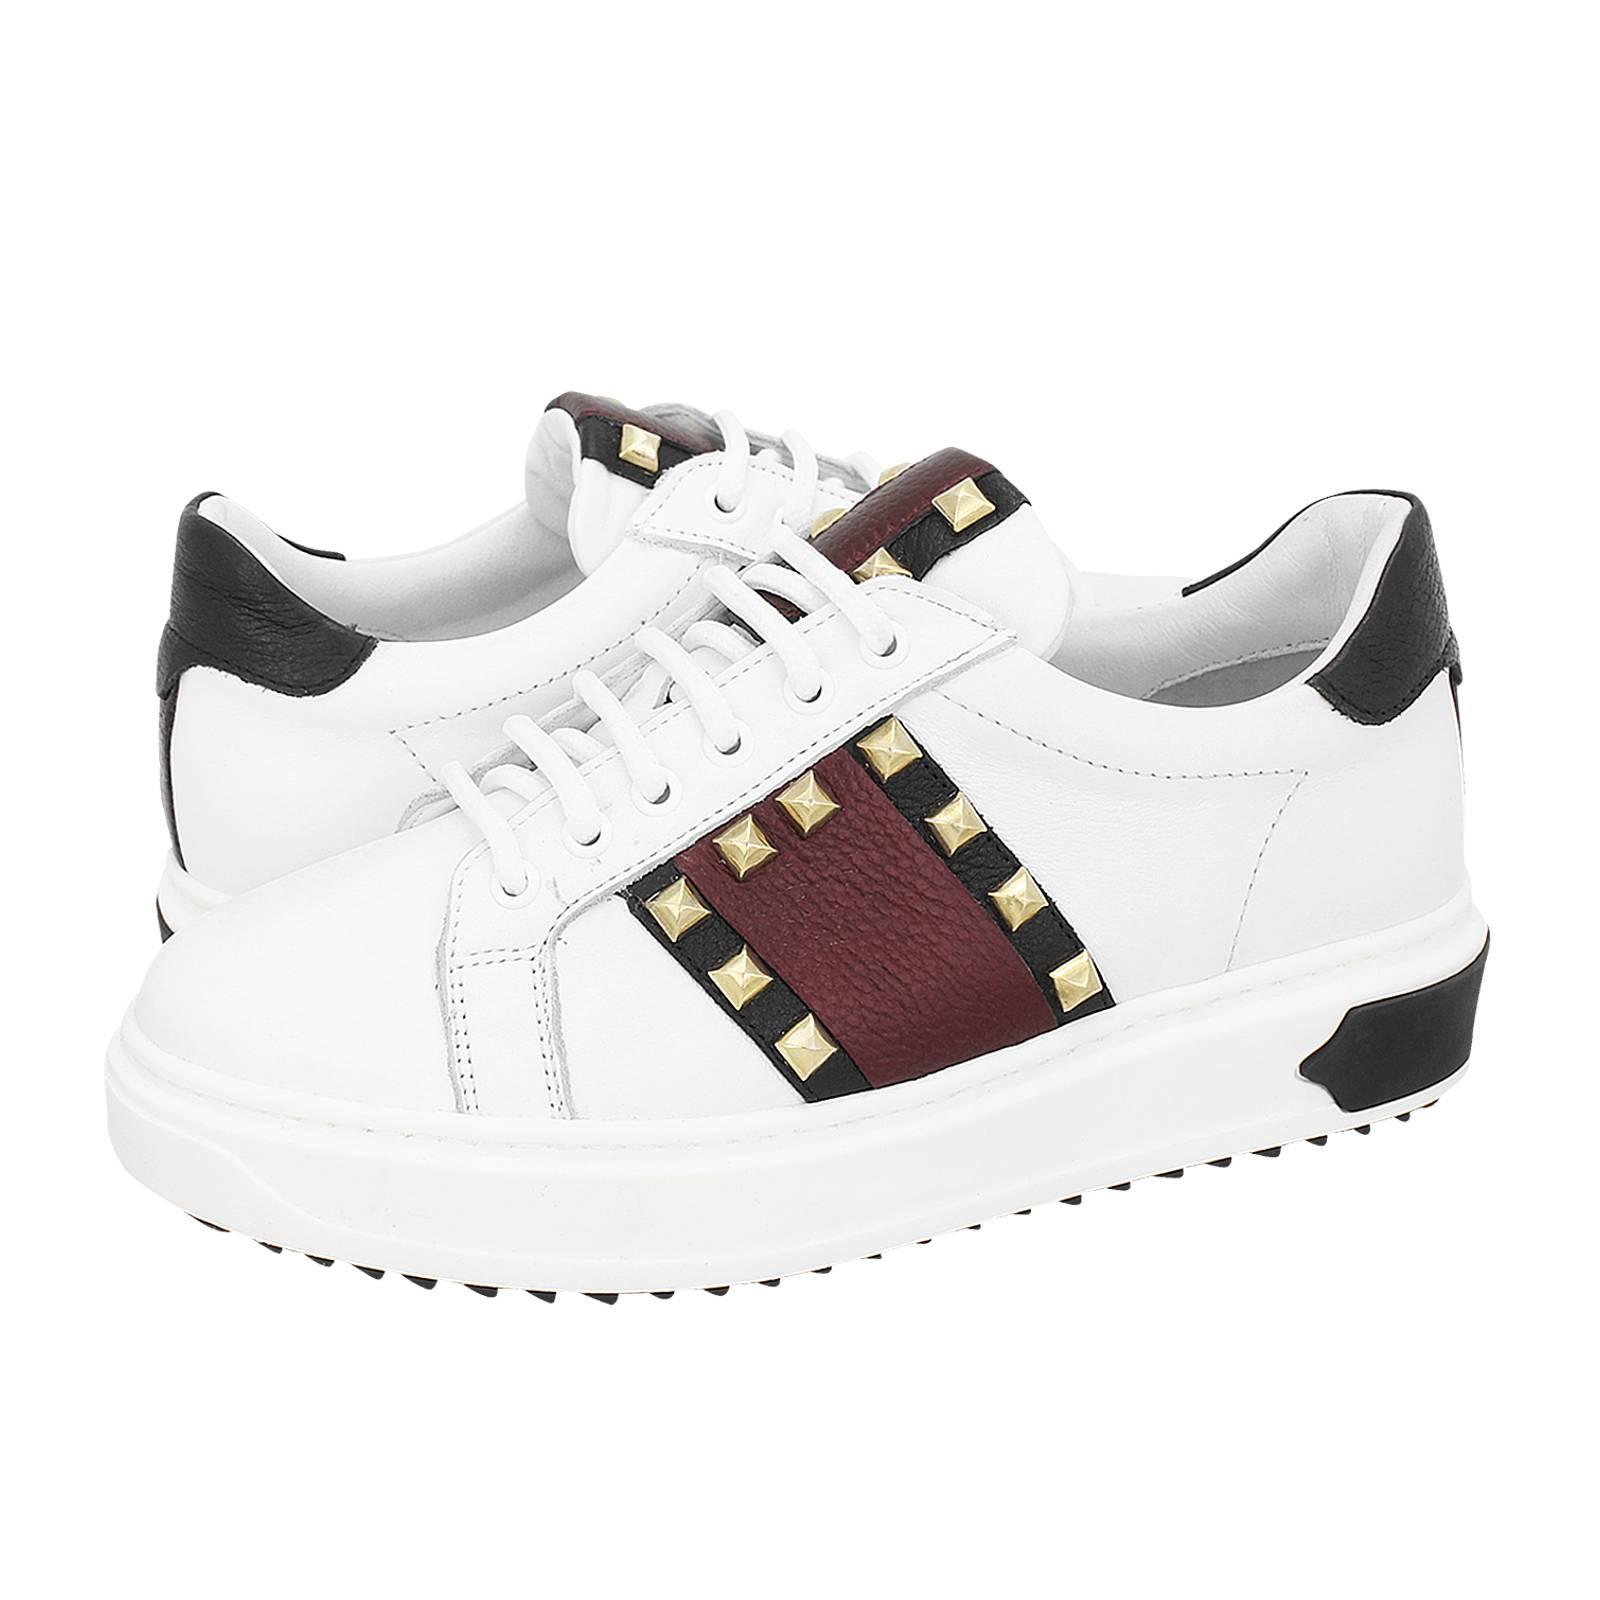 Casal - Γυναικεία παπούτσια casual Gianna Kazakou από δέρμα - Gianna ... 6fd22a6c489